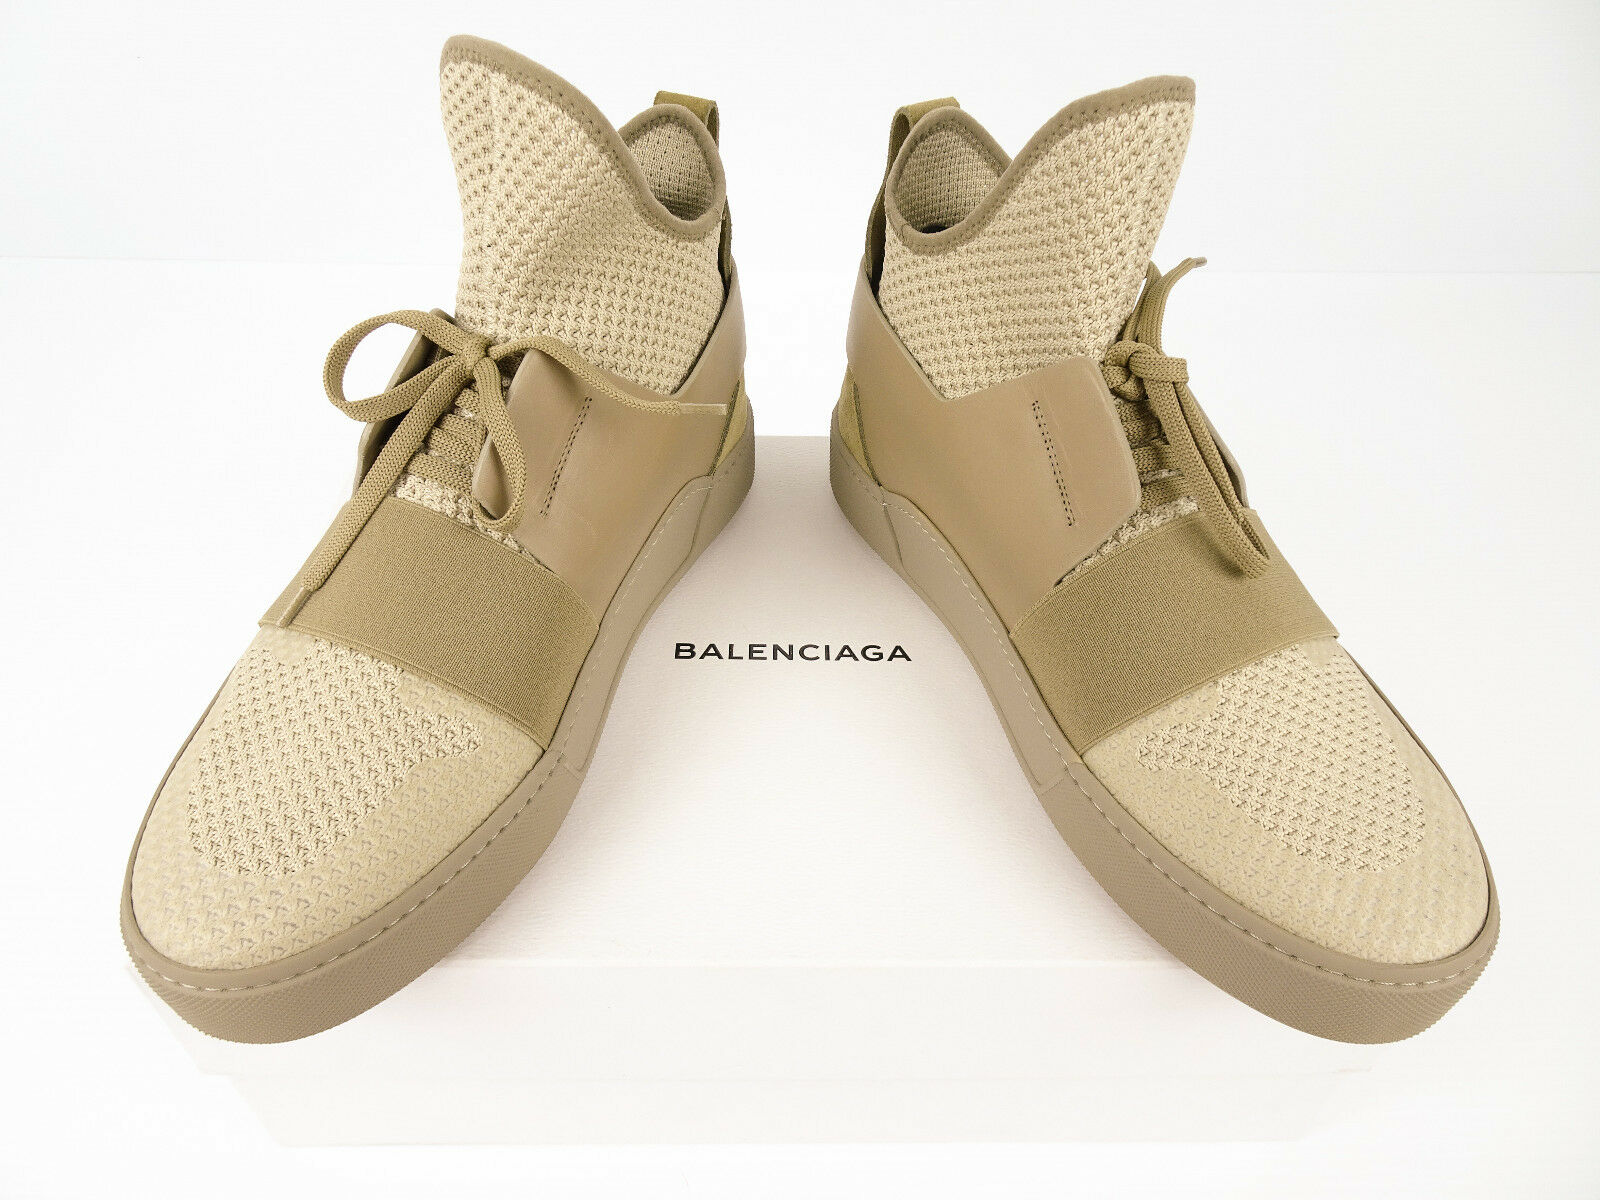 🔥 BALENCIAGA Beige Suede Leather